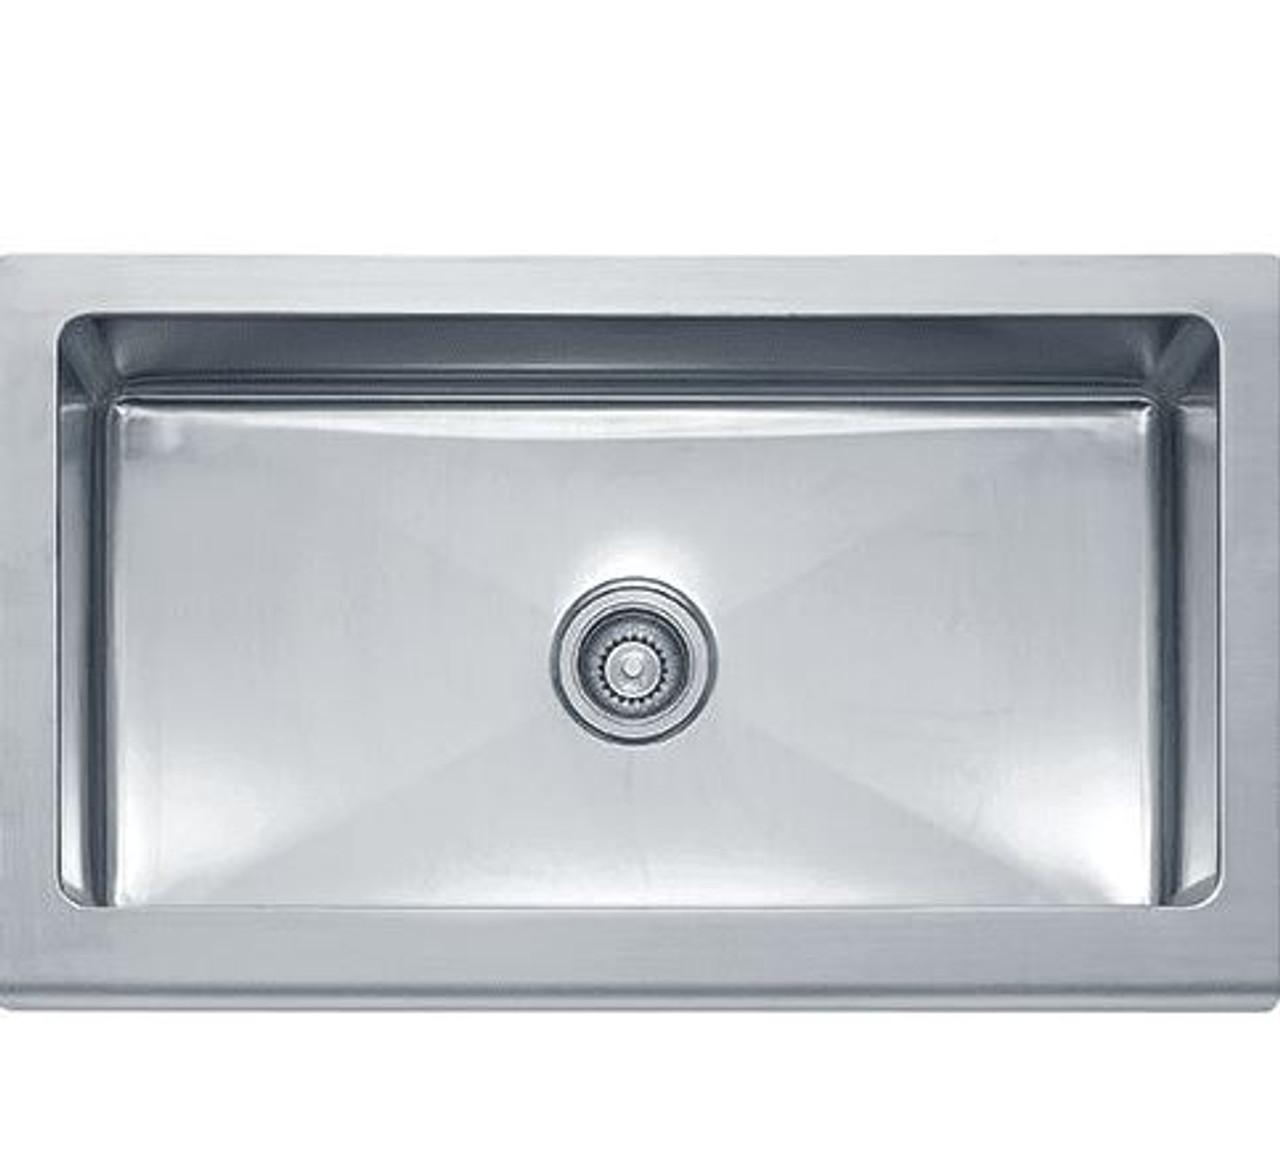 franke manor house 36 x 20 7 8 single basin farmhouse 16 gauge stainless steel kitchen sink